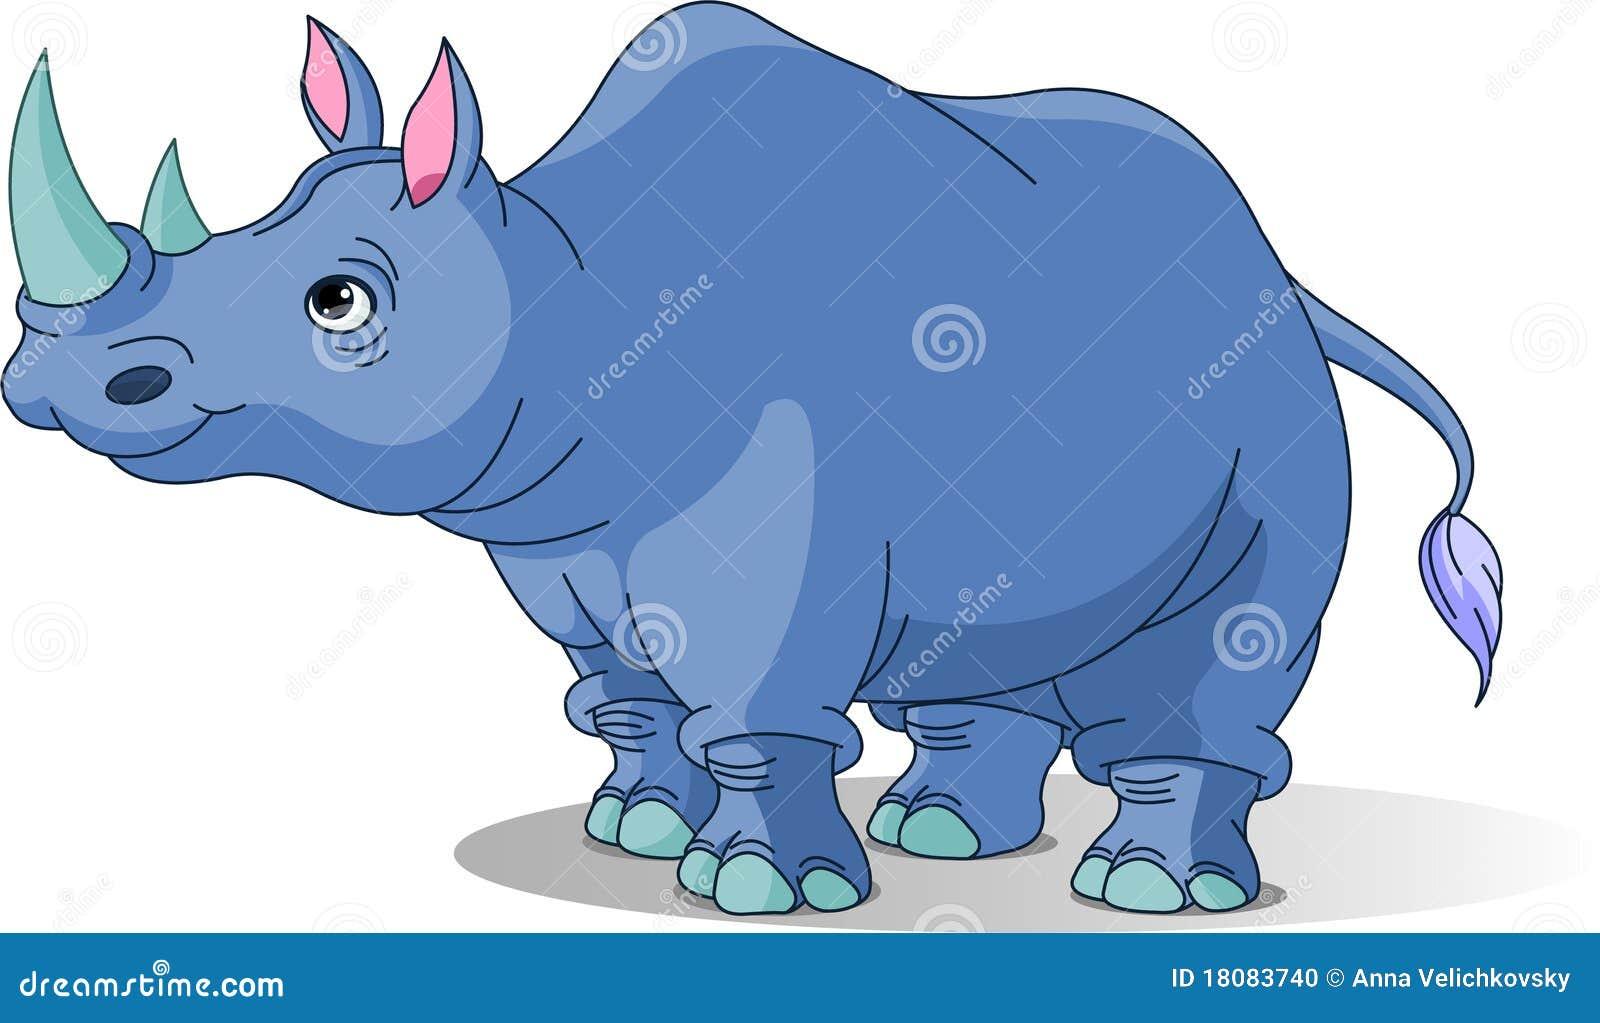 Rhinoc ros de dessin anim photo stock image 18083740 - Rhinoceros dessin ...